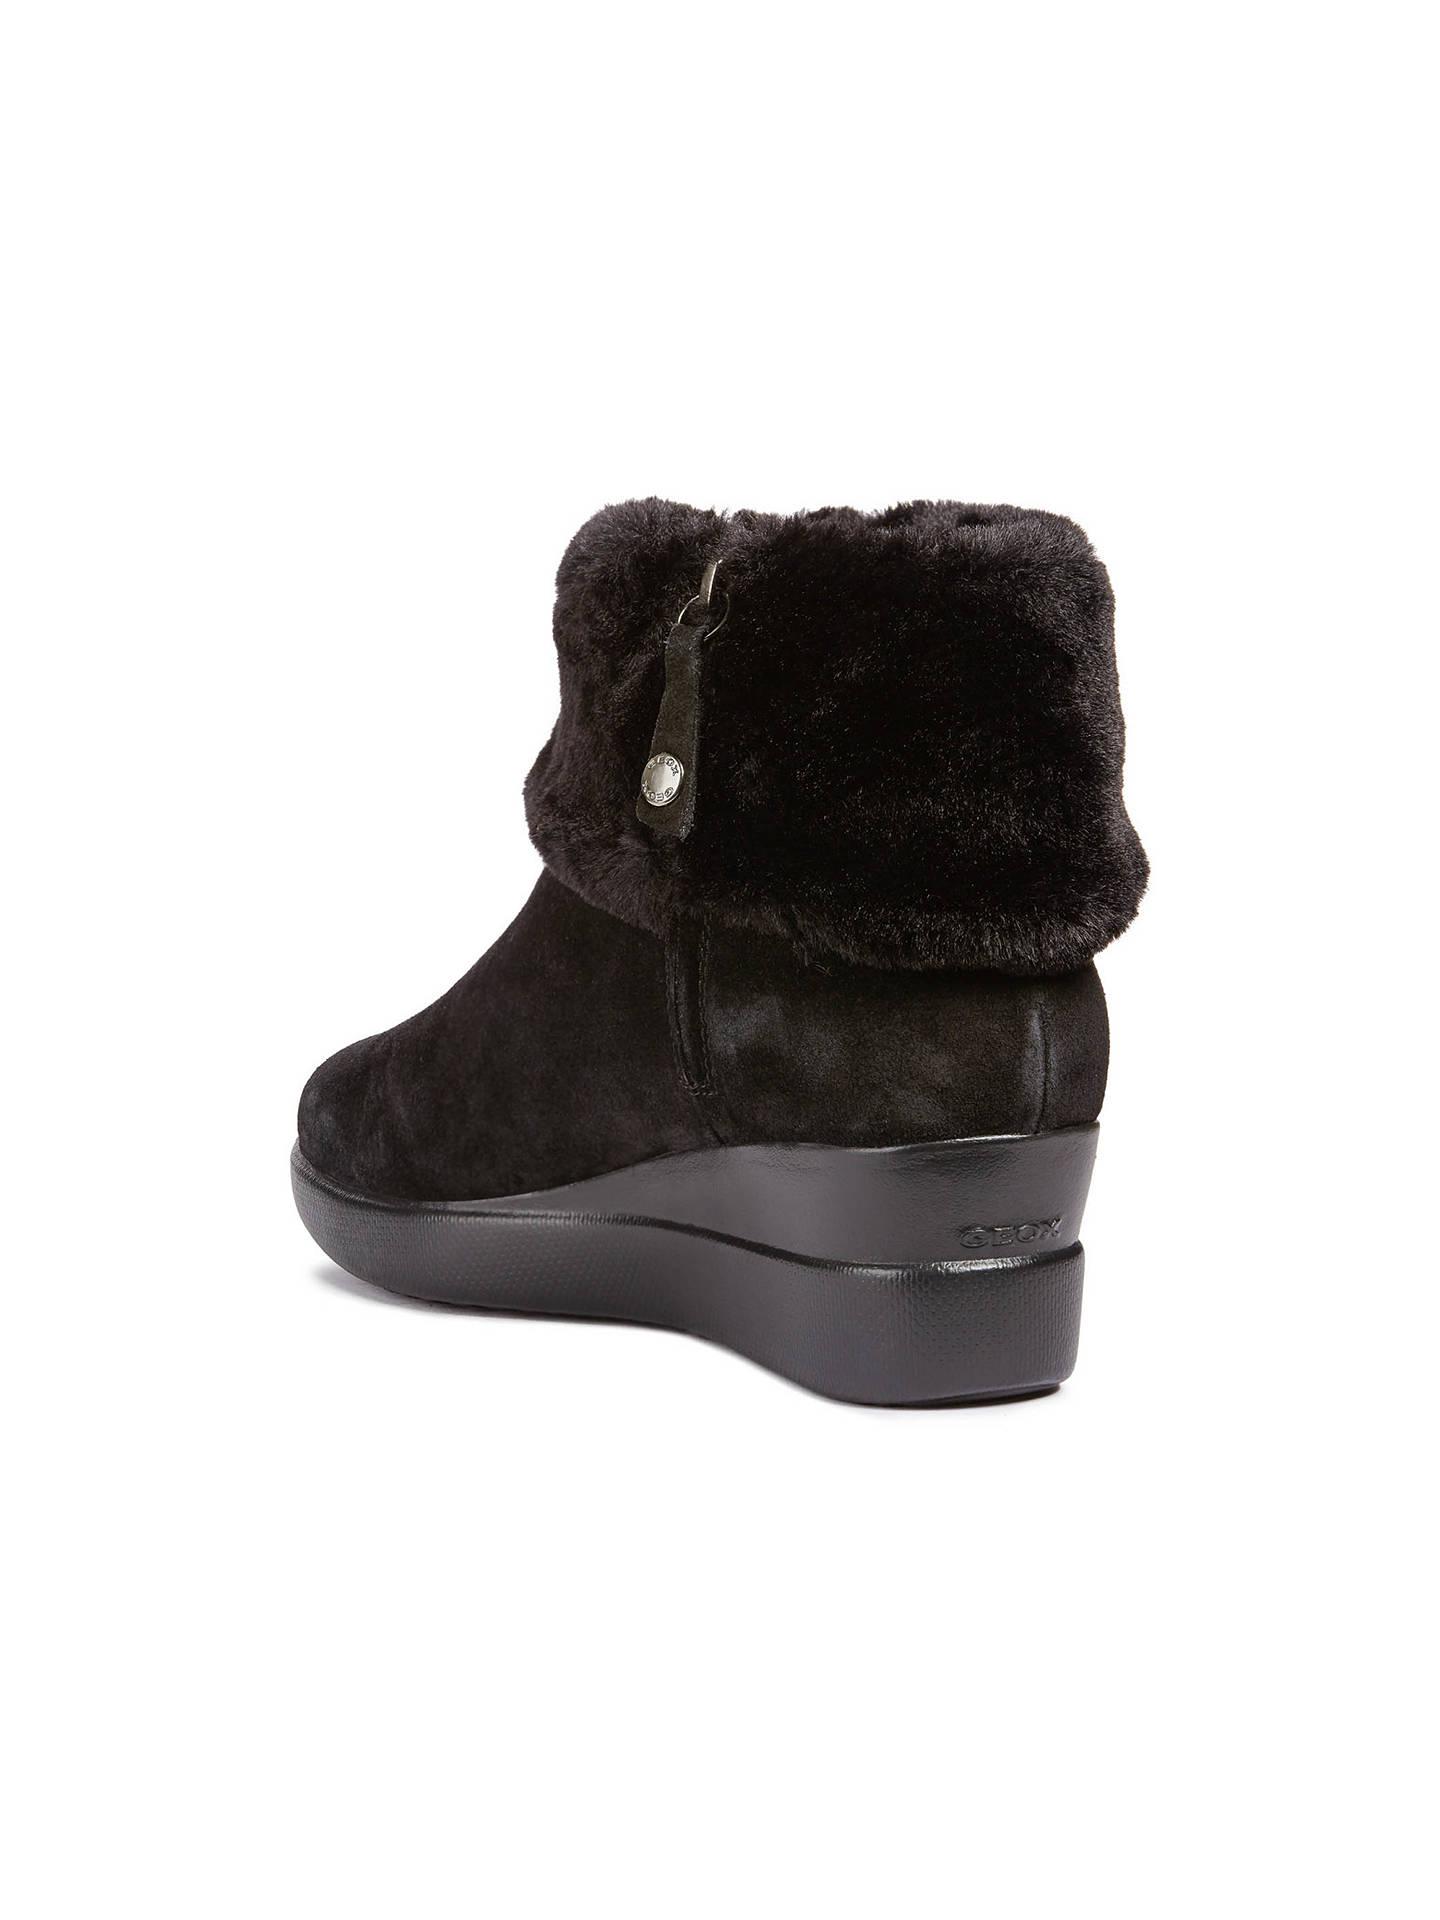 052bcccb43ff Buy Geox Women's Stardust Wedge Heel Boots, Black Suede, 3 Online at  johnlewis.